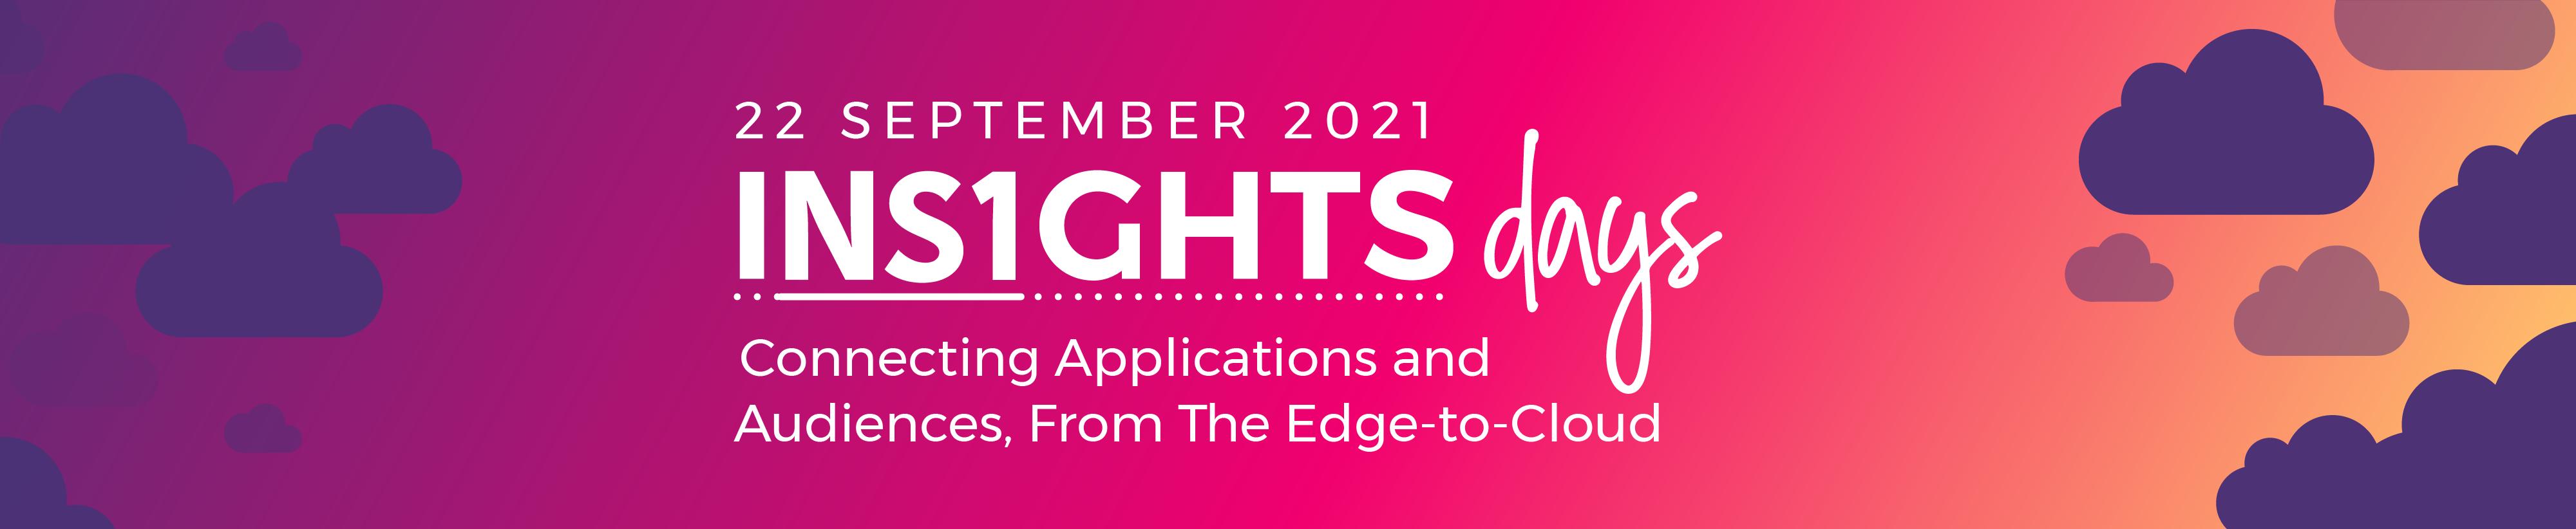 2021_INS1GHTS Days September Banner-02